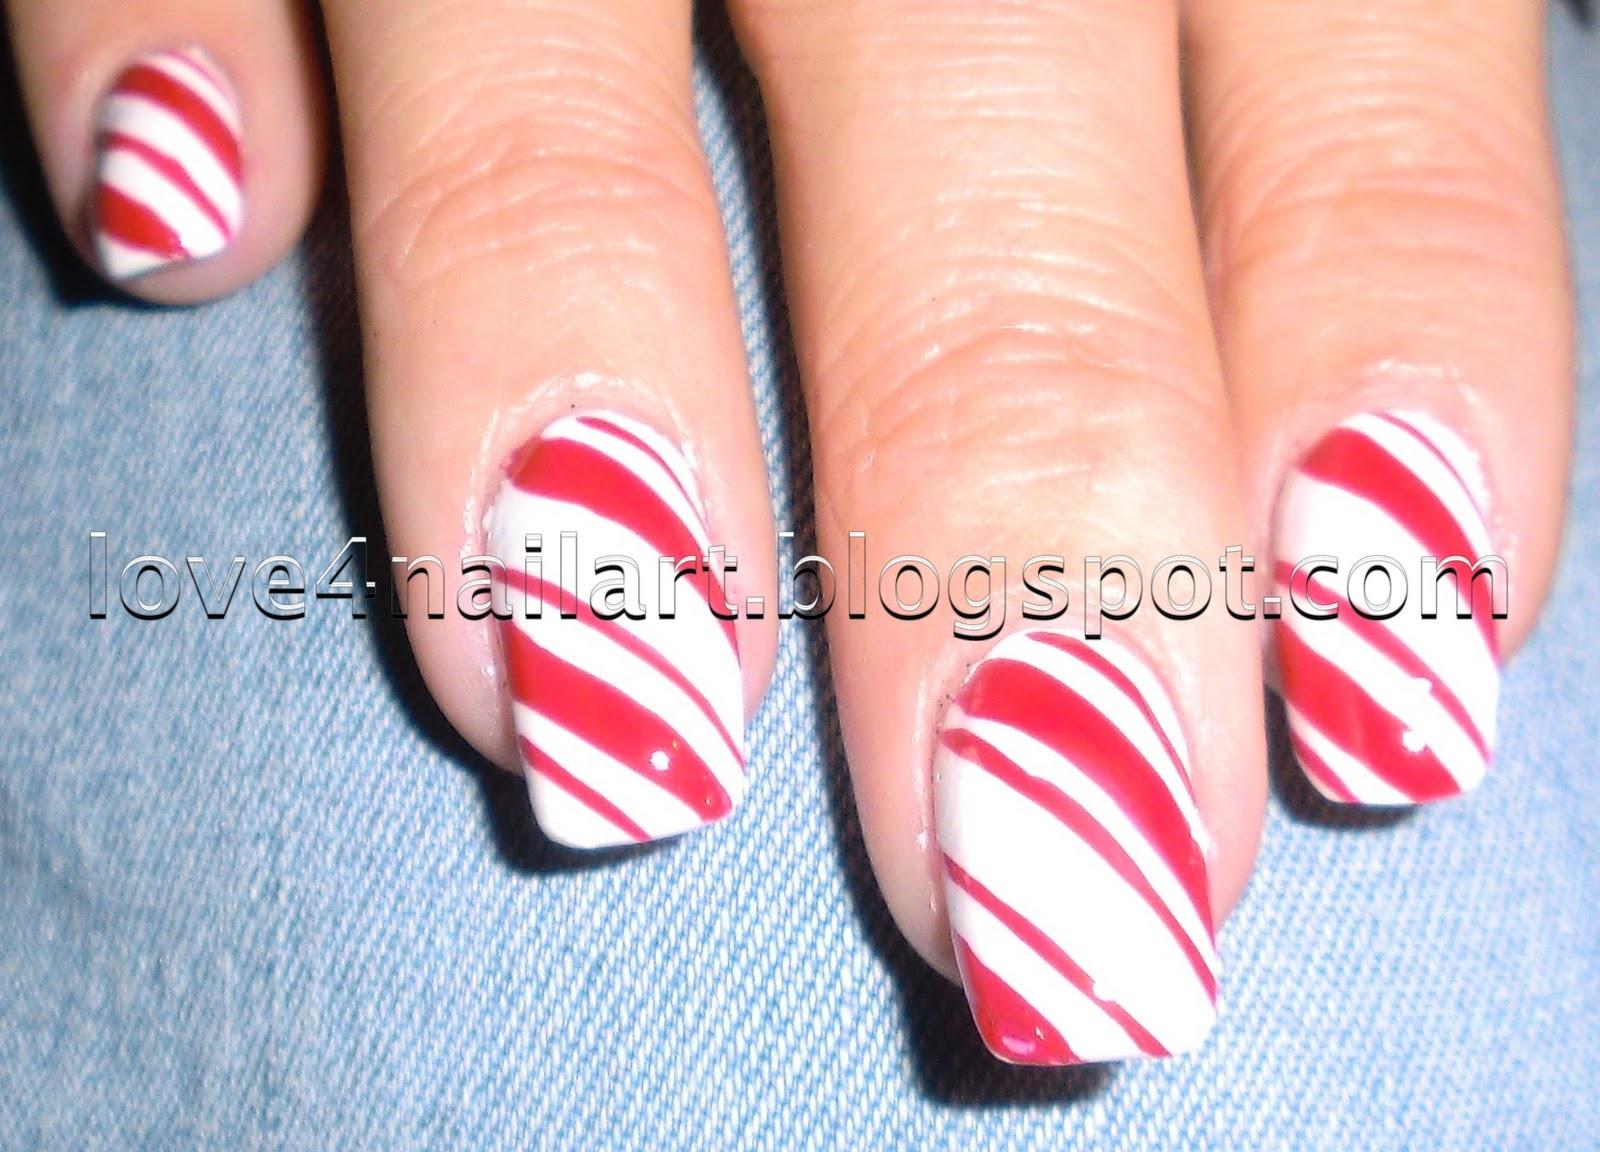 love4nailart candy cane nails queenofblendingmua